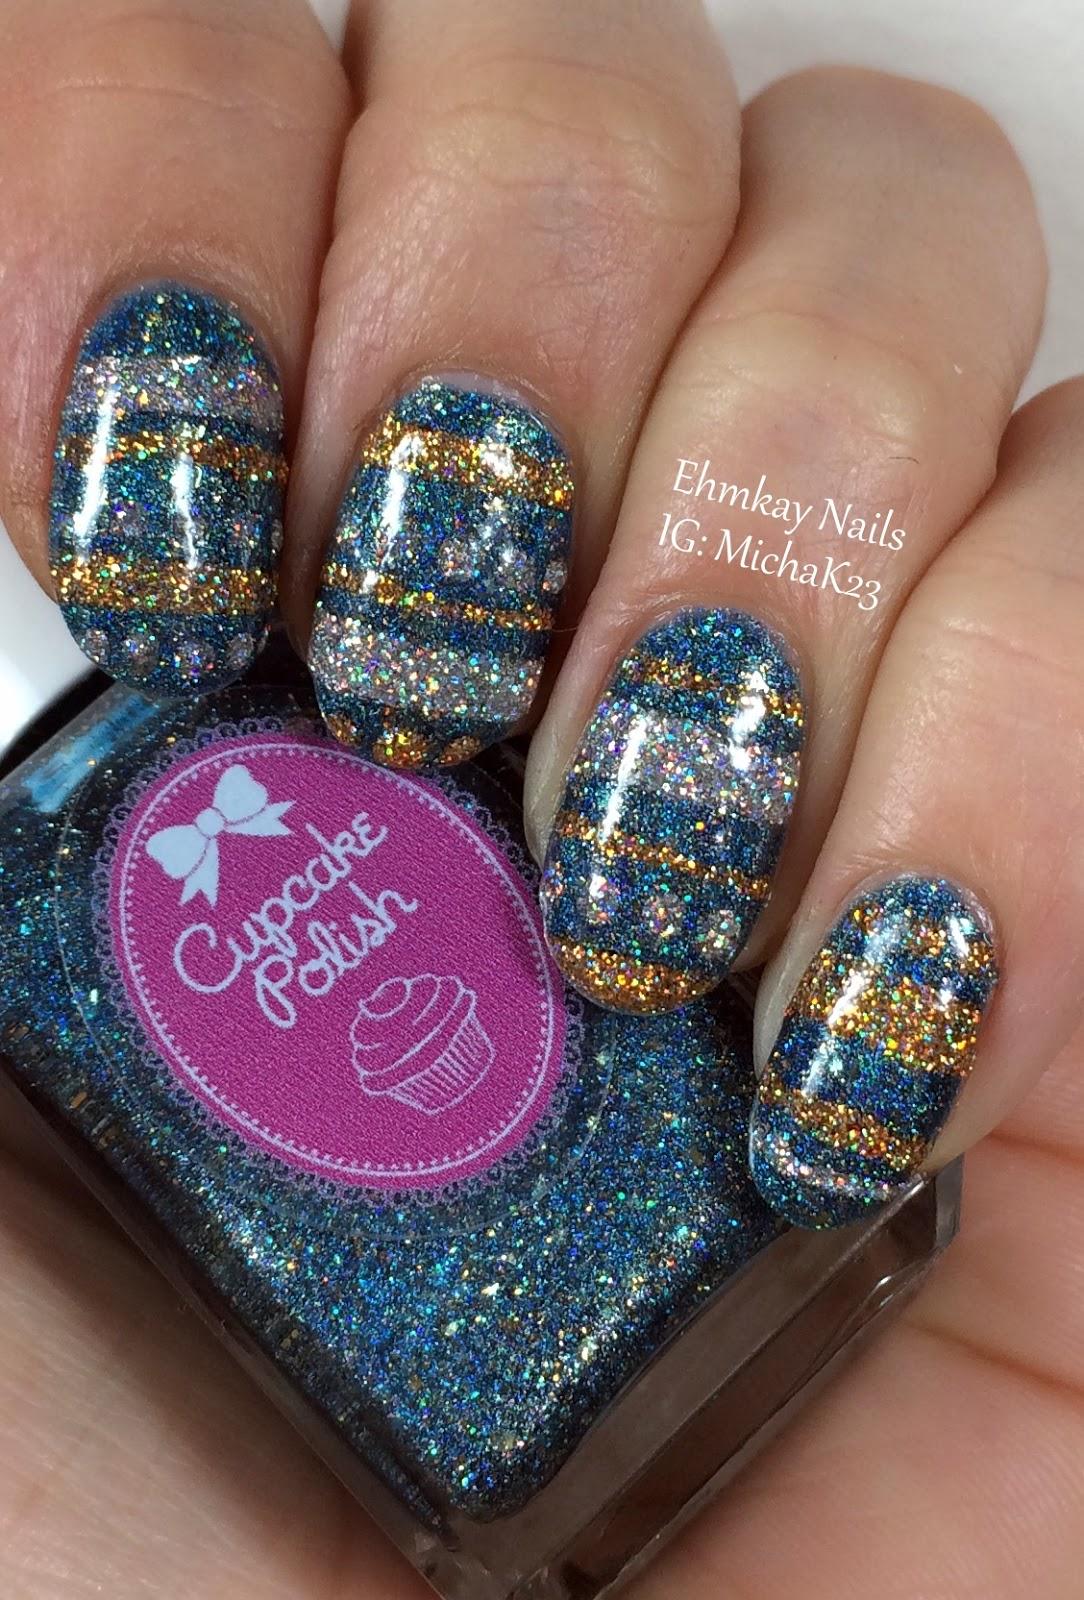 Ehmkay Nails New Year S Eve Nail Art With Kbshimmer Bling: Ehmkay Nails: Chanukah Nail Art: Chanukah Ornaments